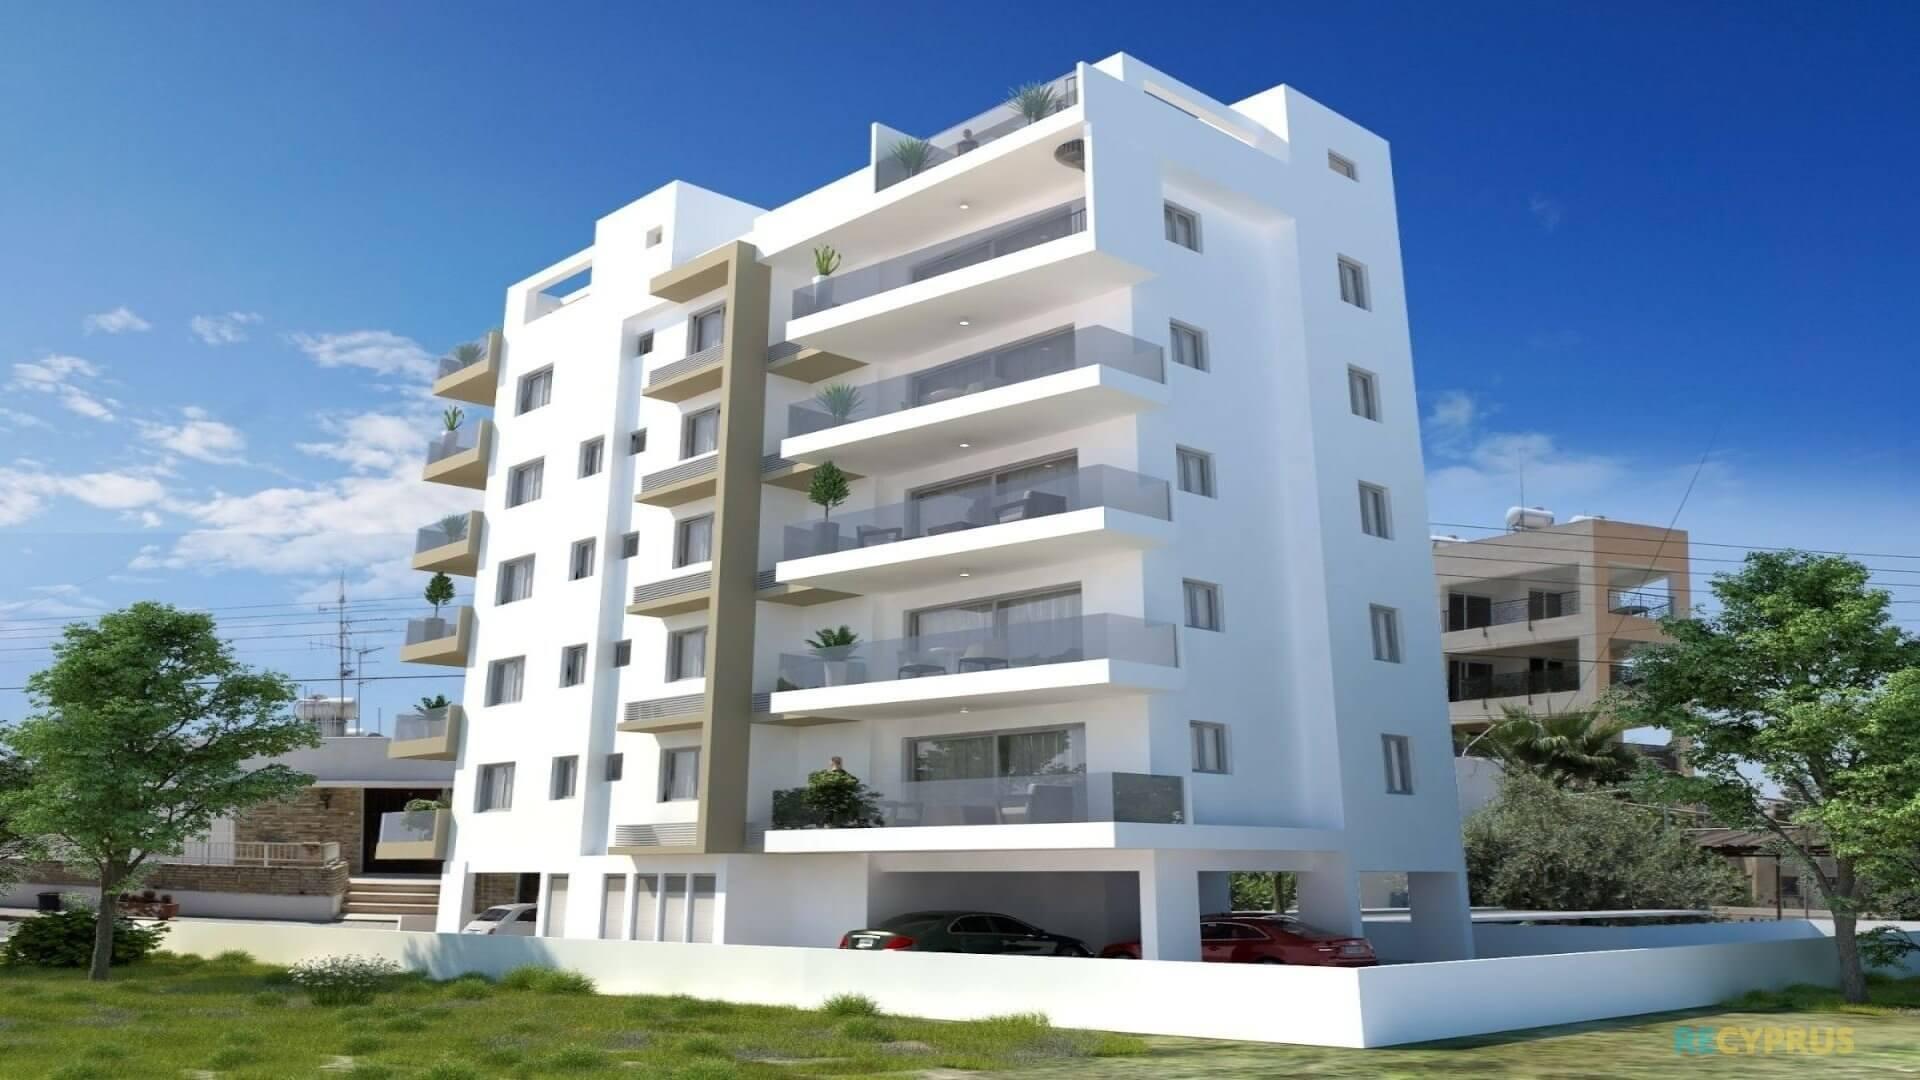 Apartment for sale City Center Larnaca Cyprus 1 3595